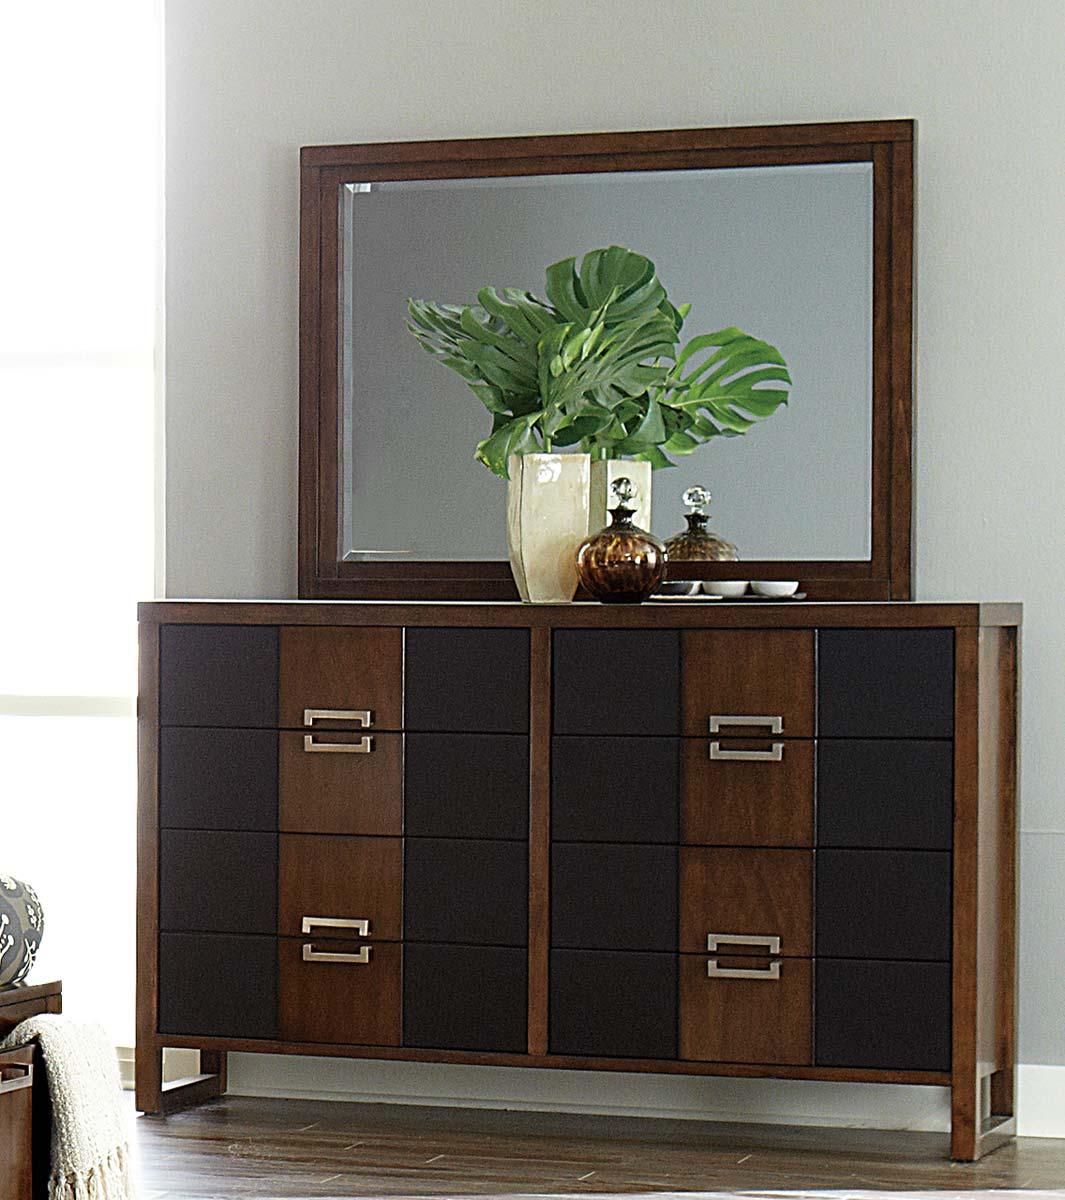 Homelegance Zeigler Dresser - Brown Cherry